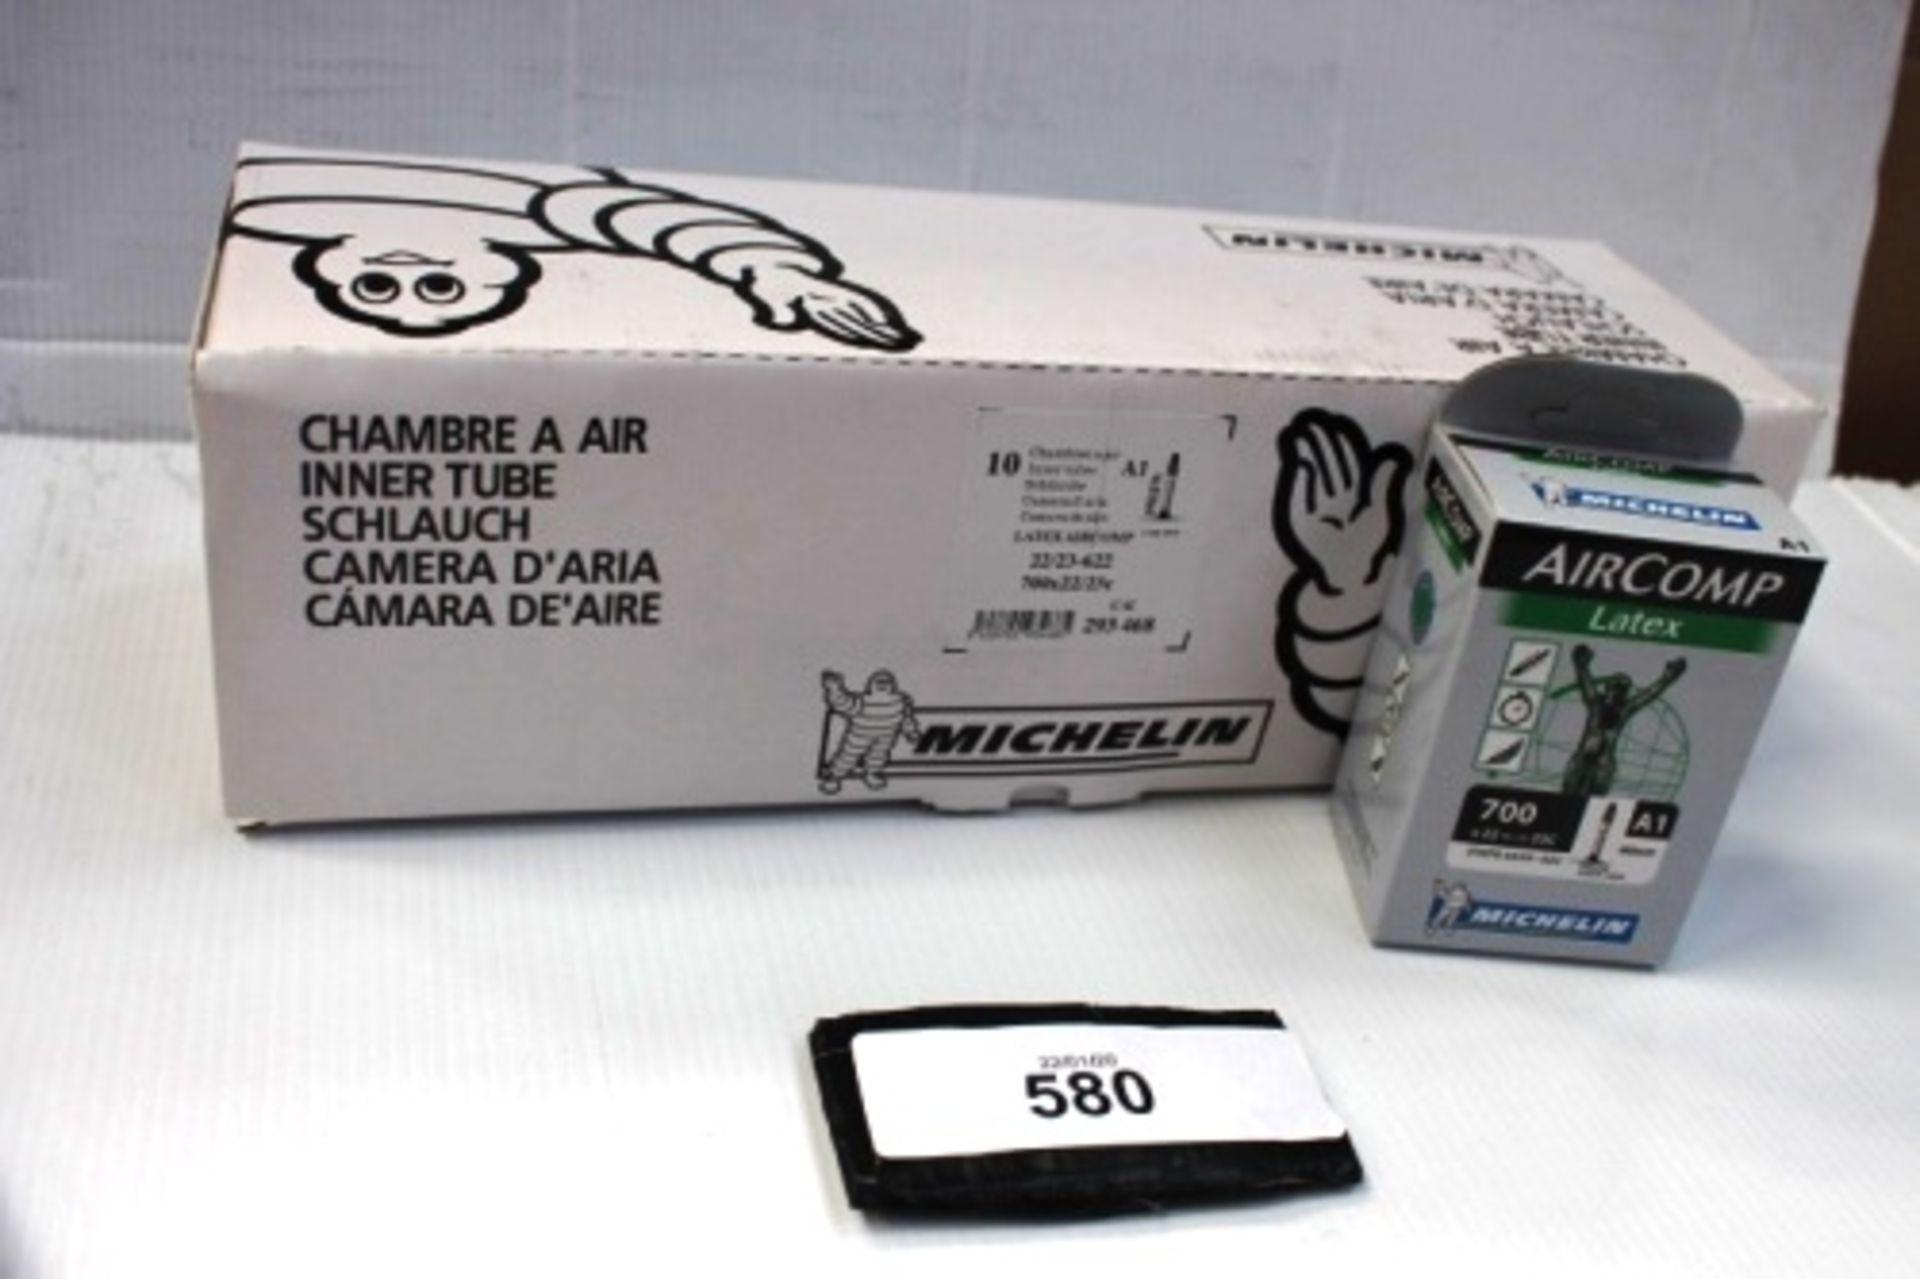 Lot 580 - 10 x Michelin Air Comp Latex 60mm 700 x 22/23C inner tubes - New in box (ES13)